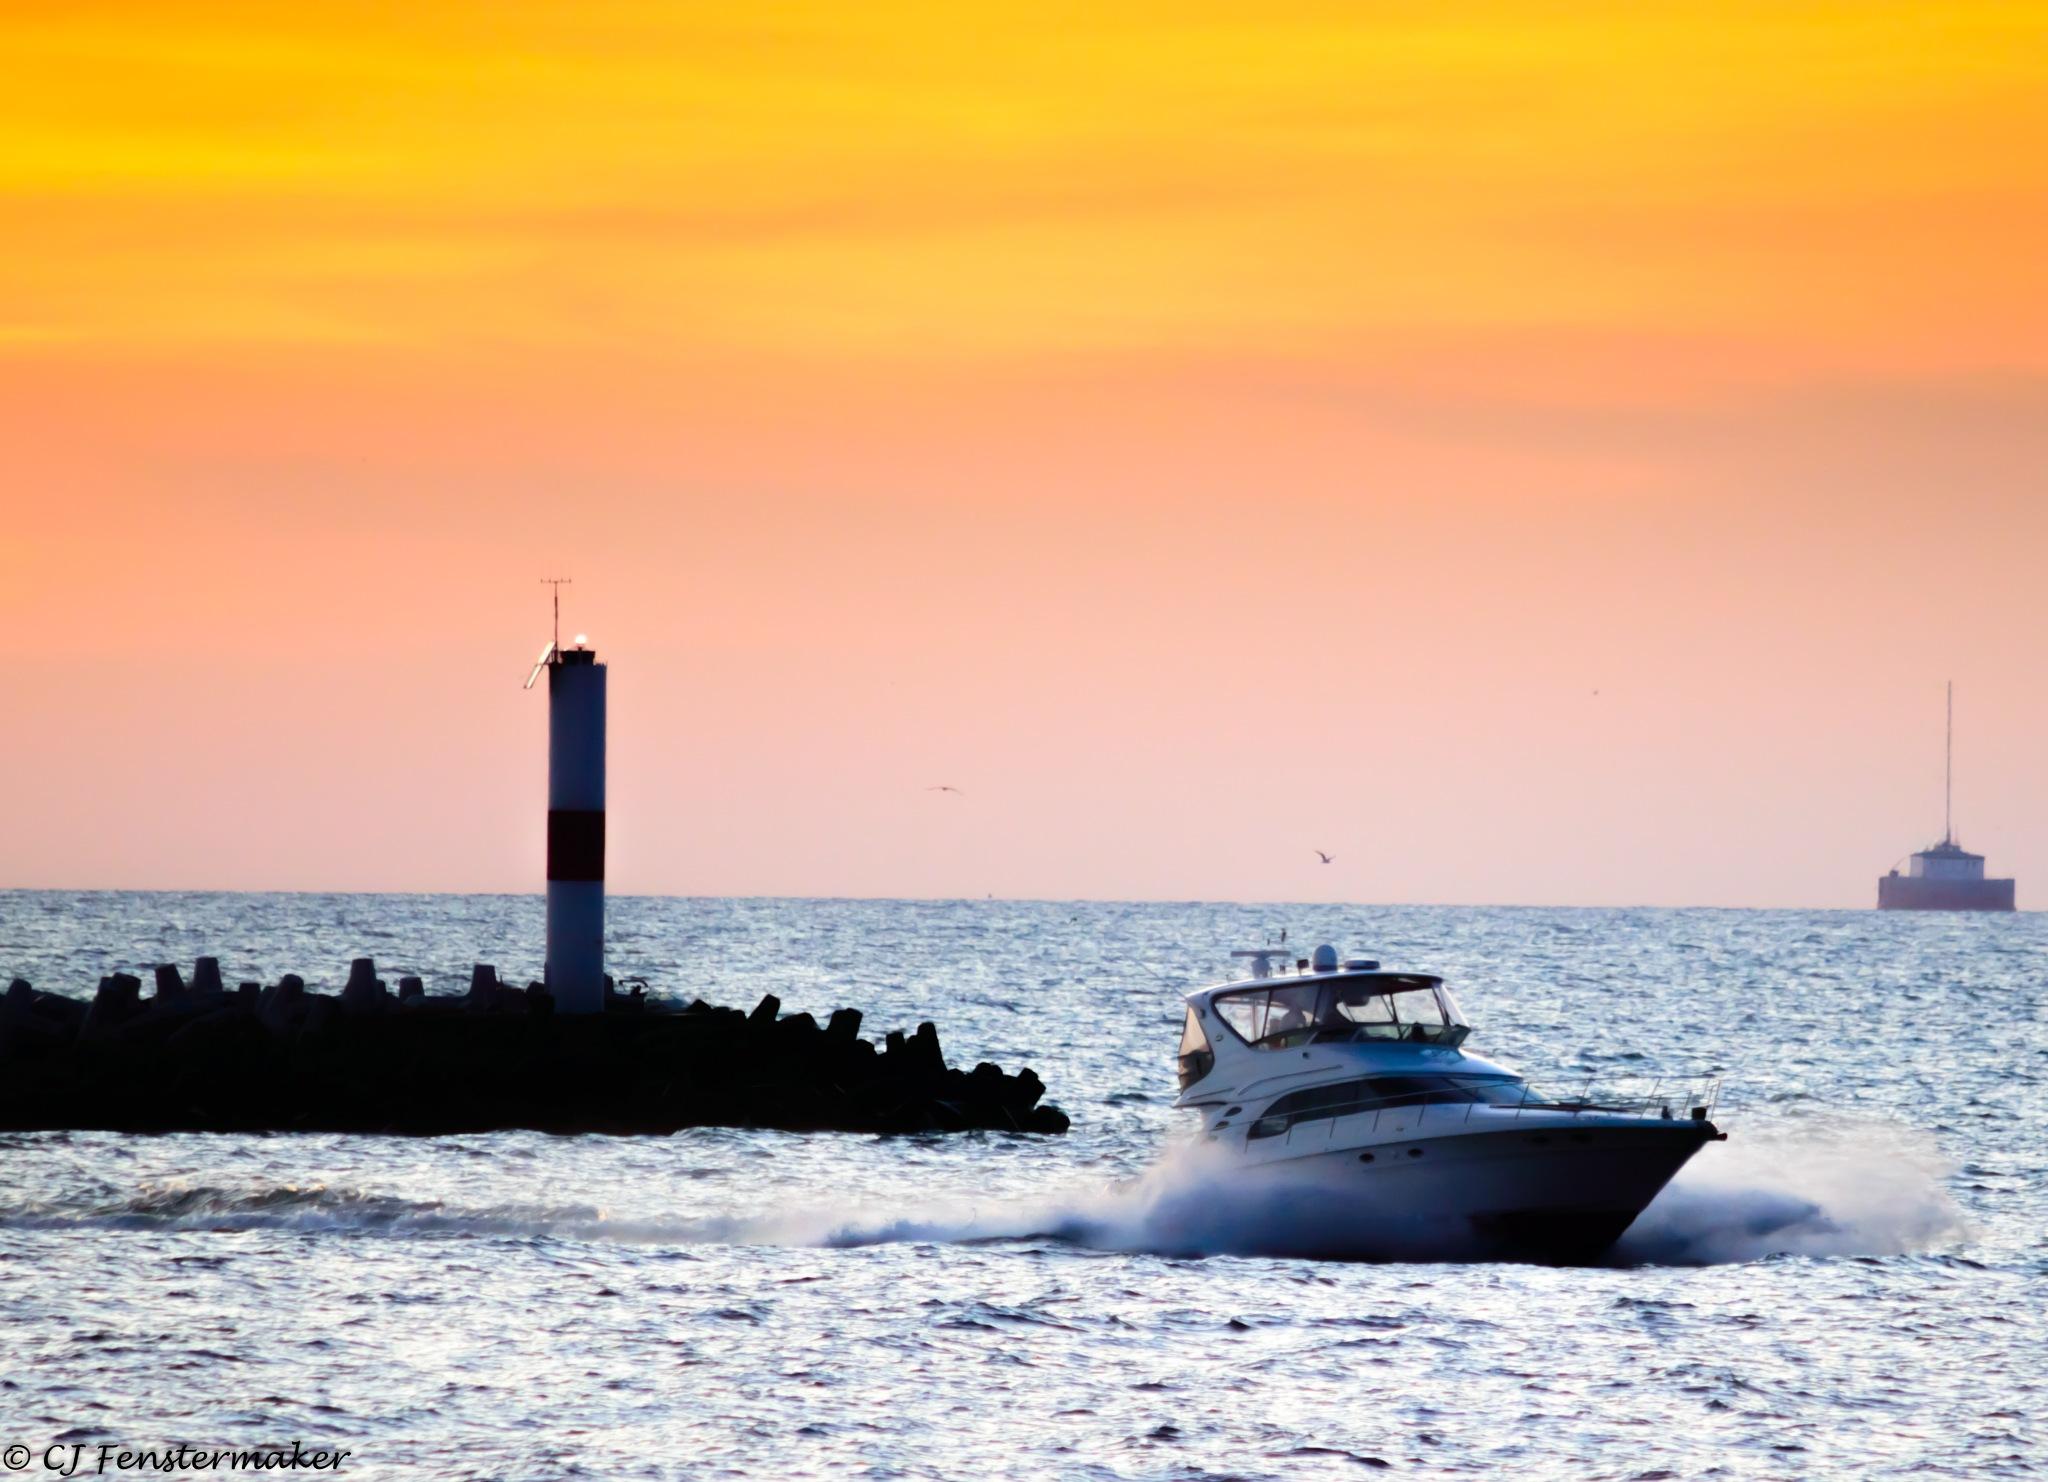 Dusk on the Marina by CJ Fenstermaker